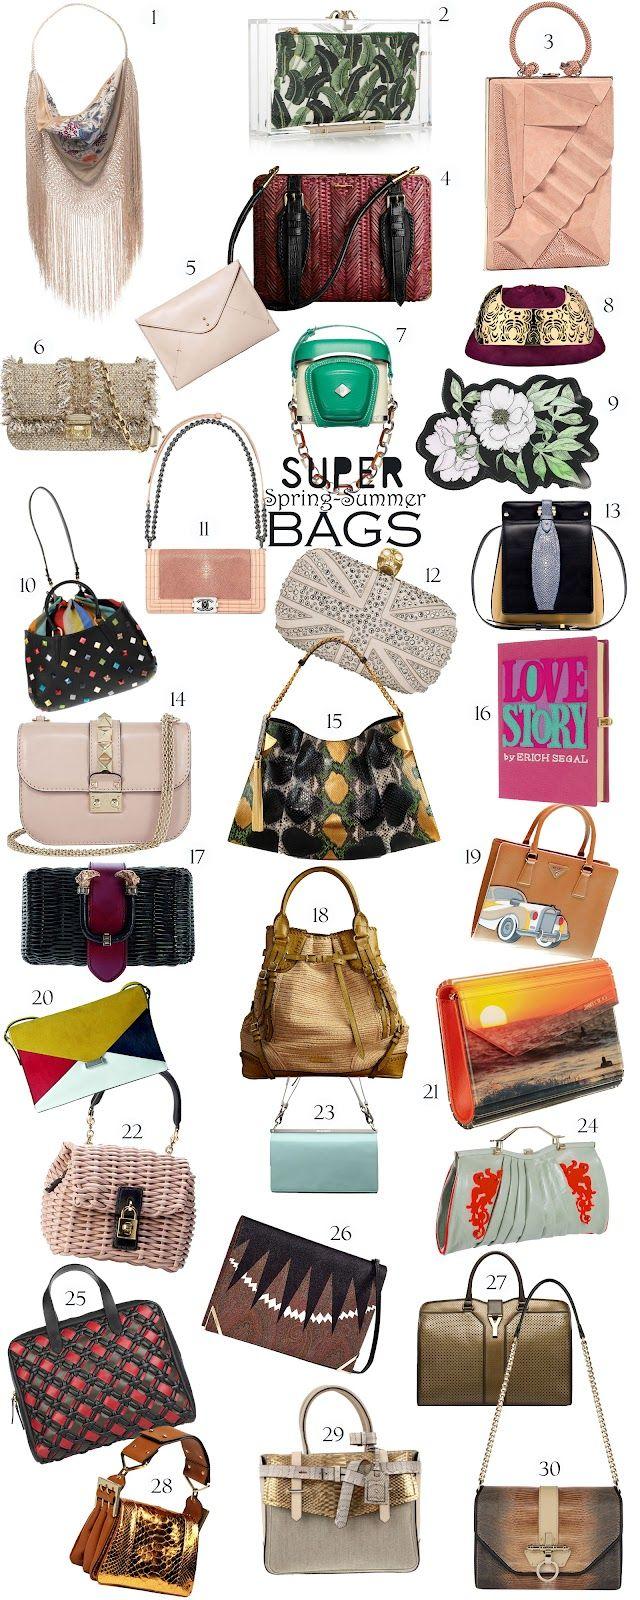 Fashion Zoom: Super Spring-Summer Bags 2012 - ElectroMode